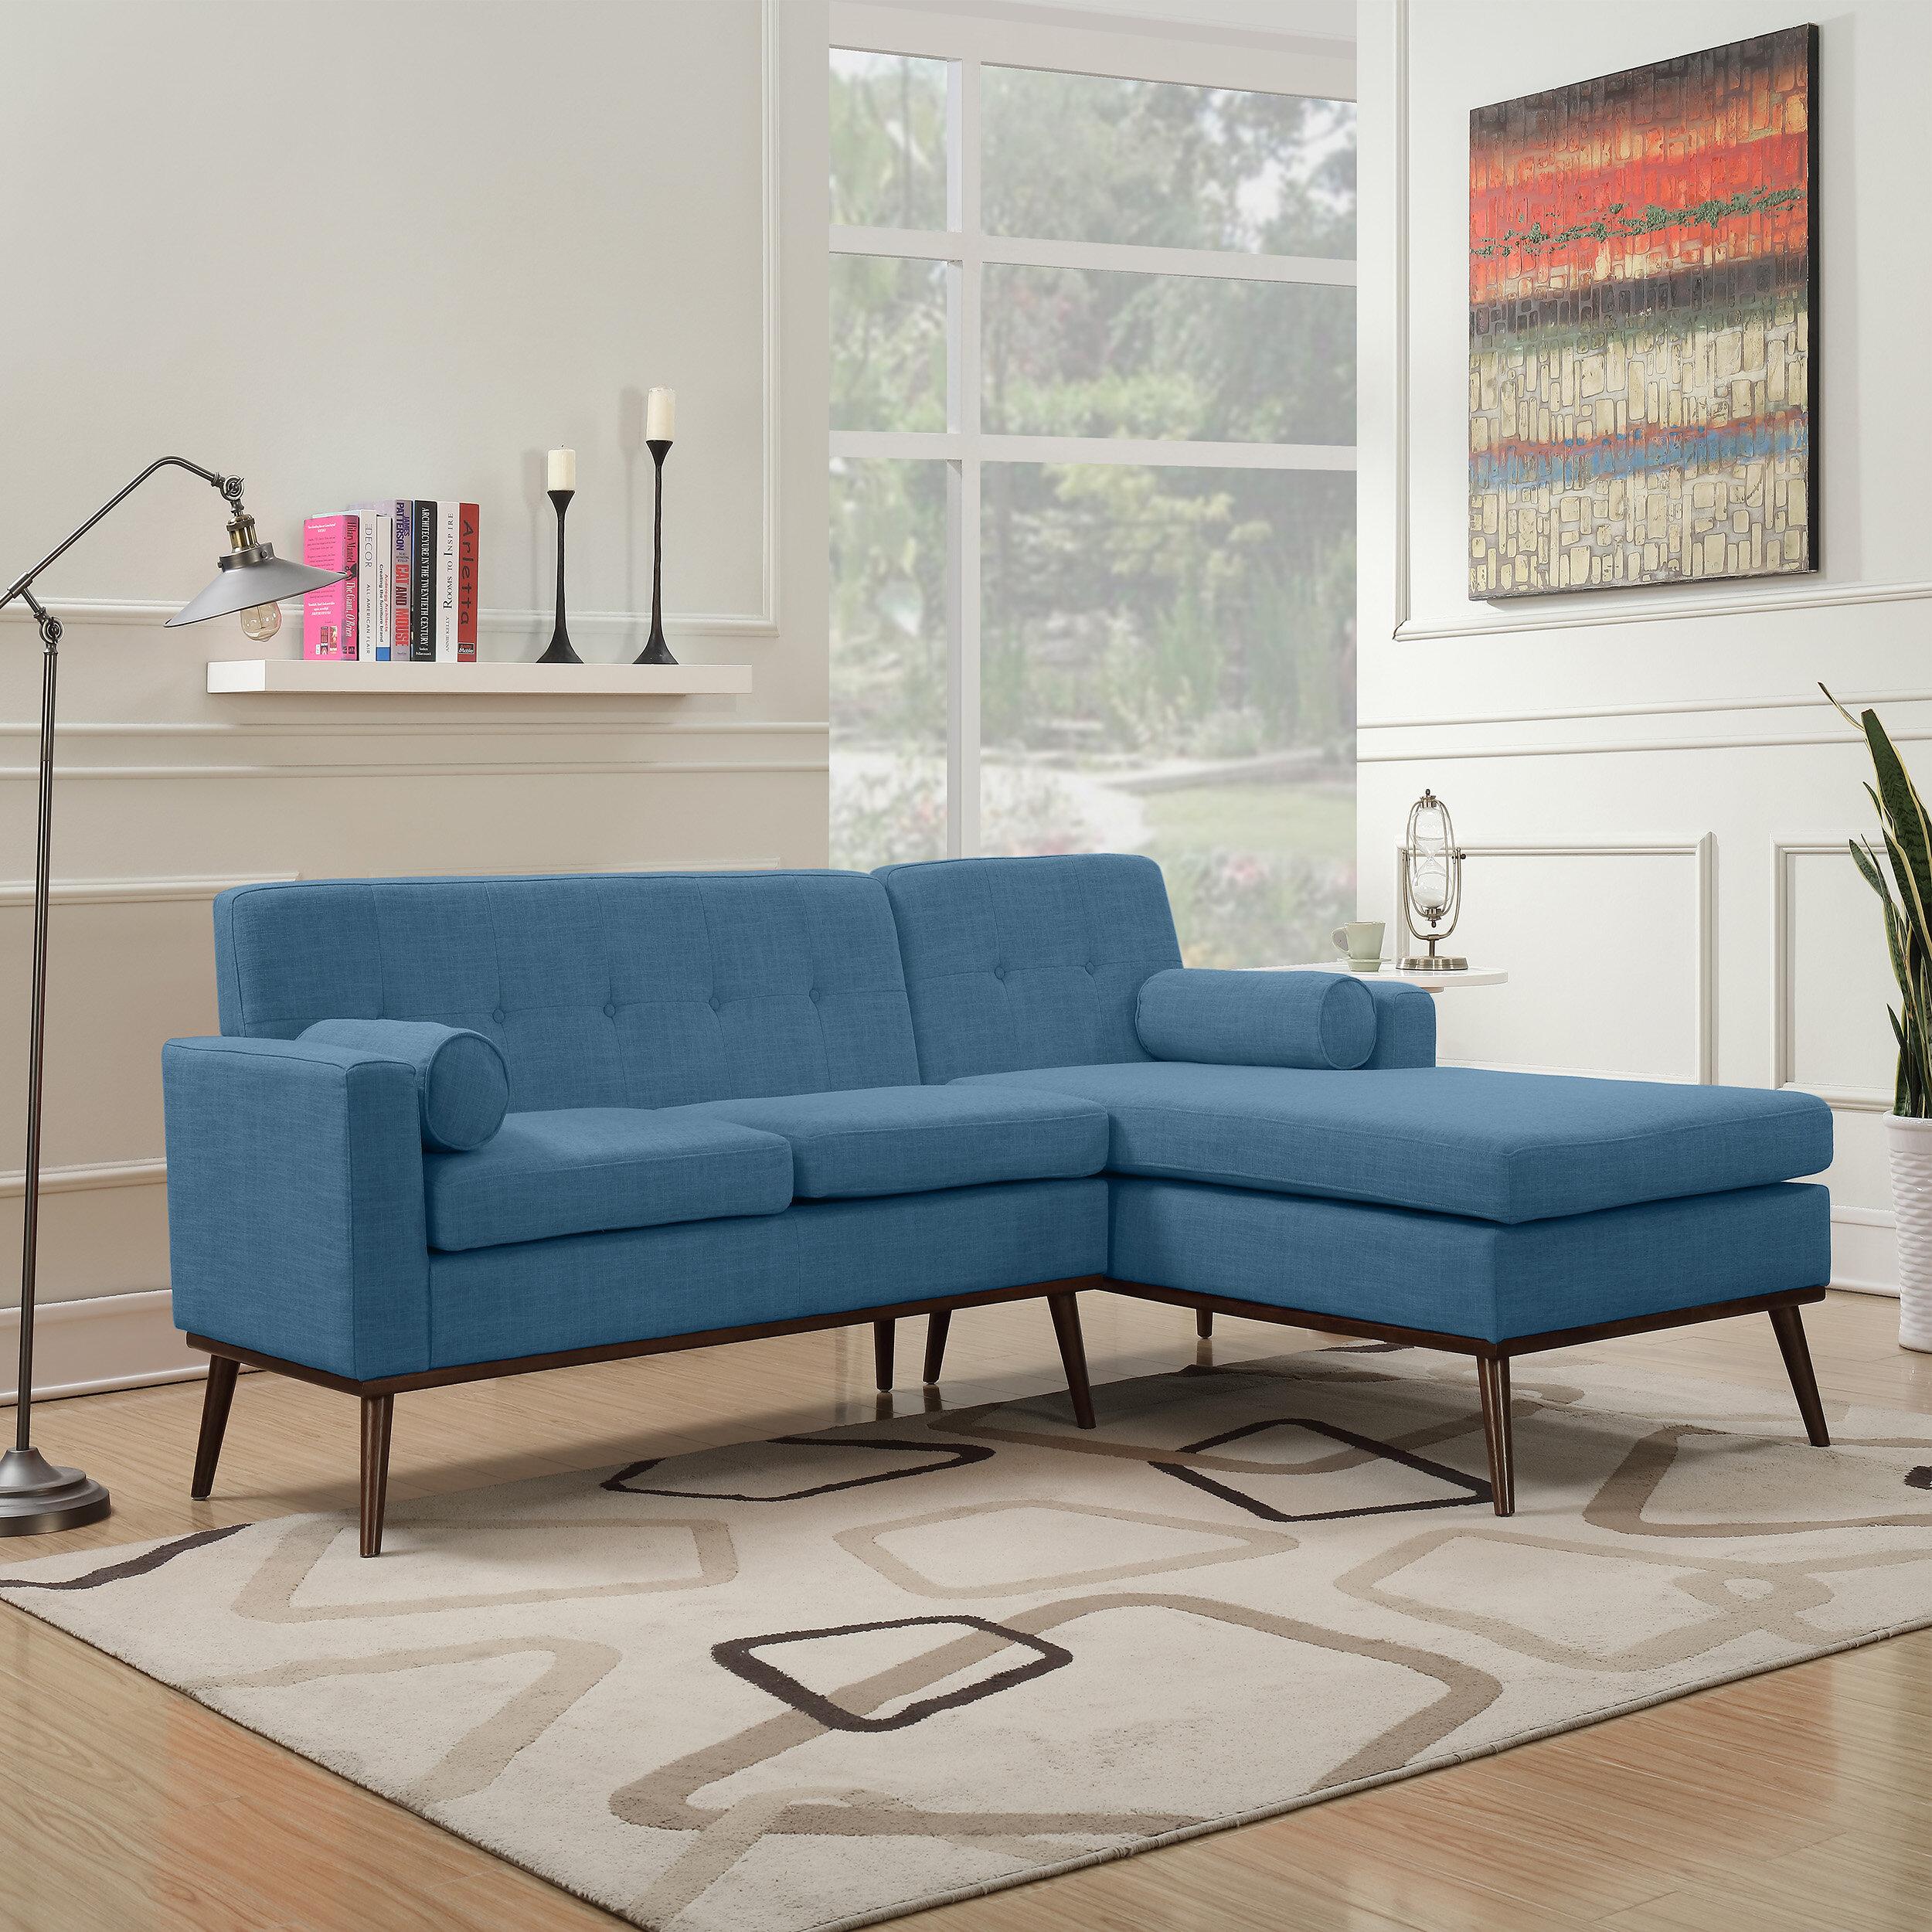 George Oliver Charlcombe Mid Century Modern Modular Sectional Sofa